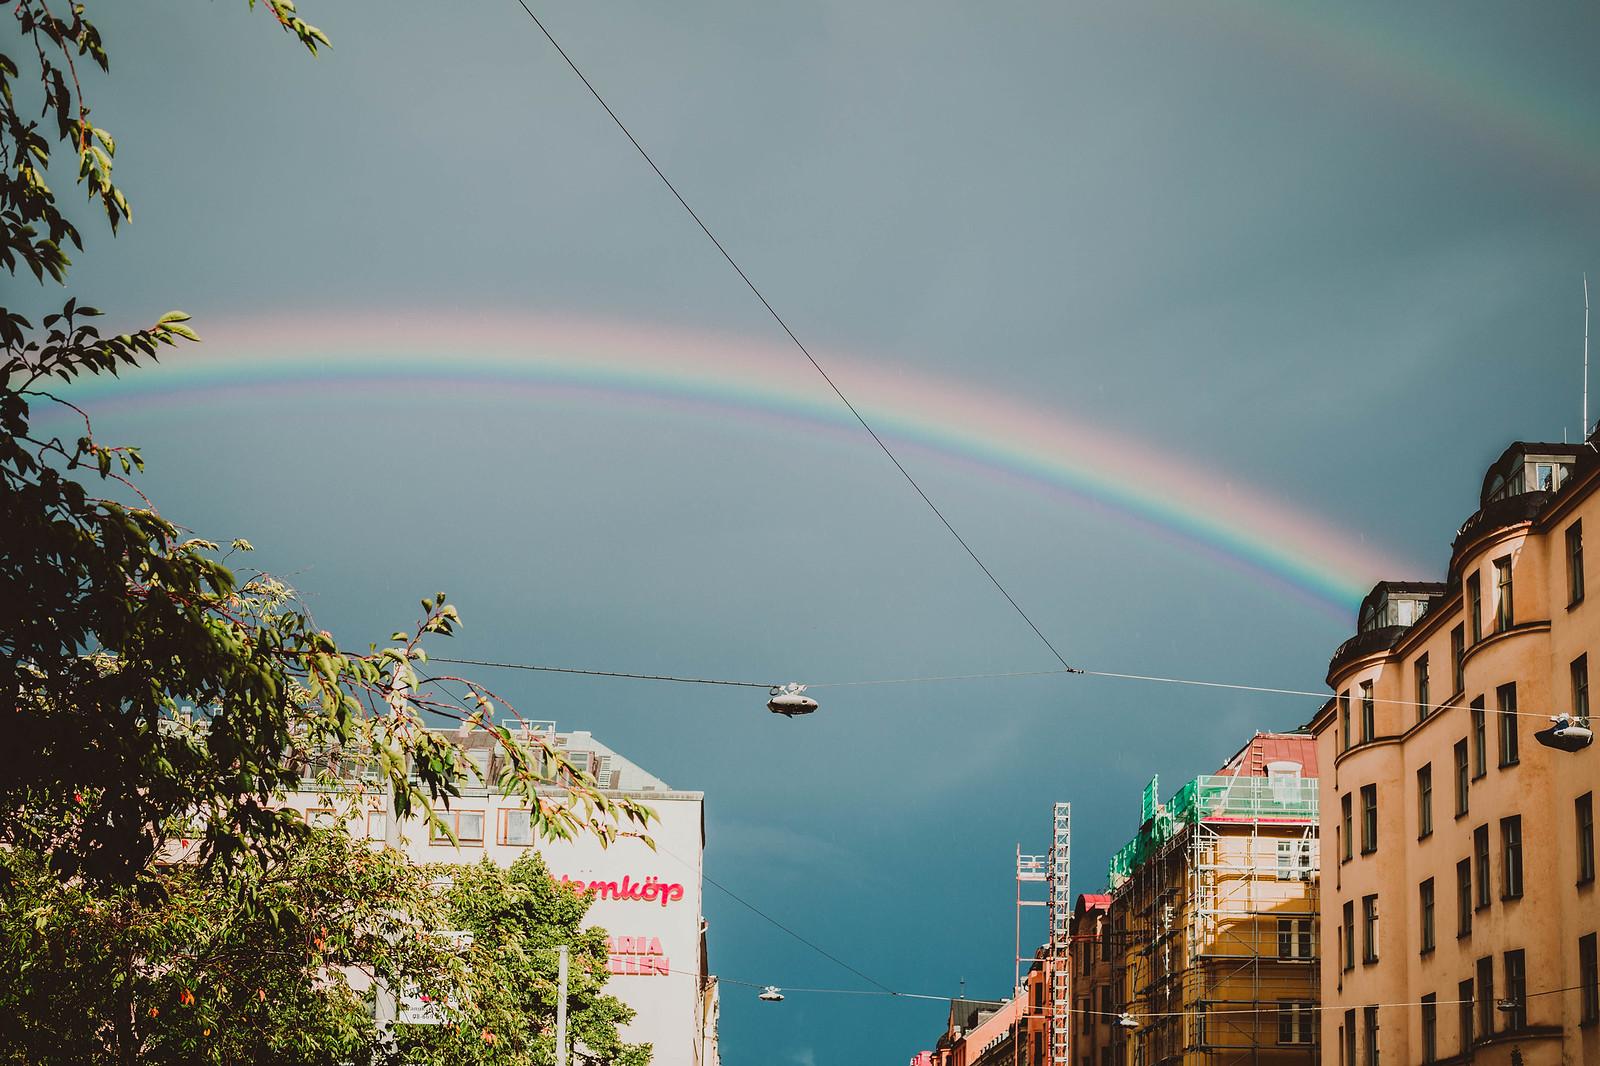 Regnbåge - Evelinas Ekologiska